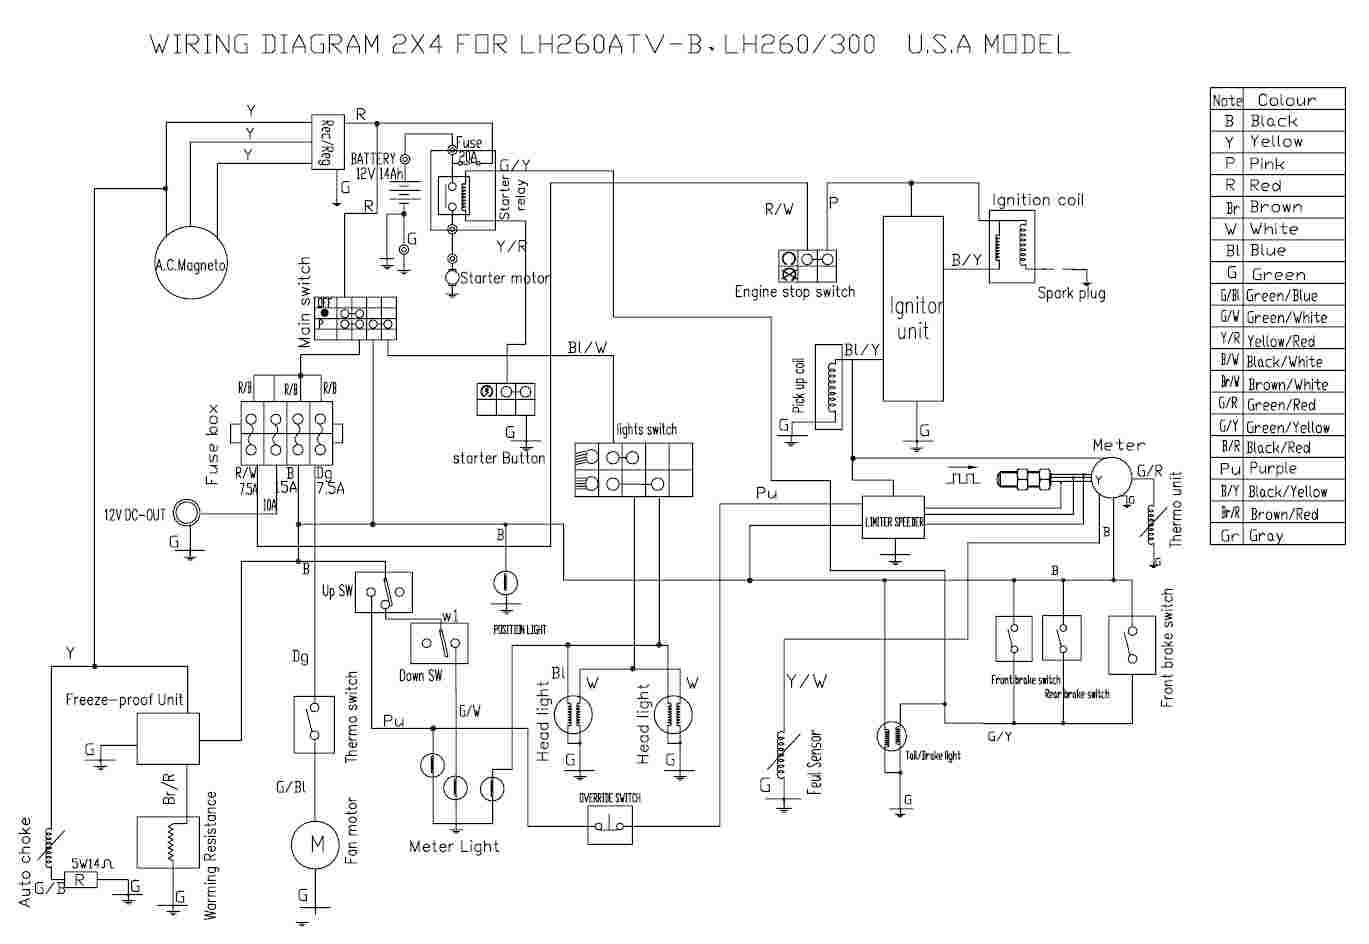 2000 ds650 wiring diagram